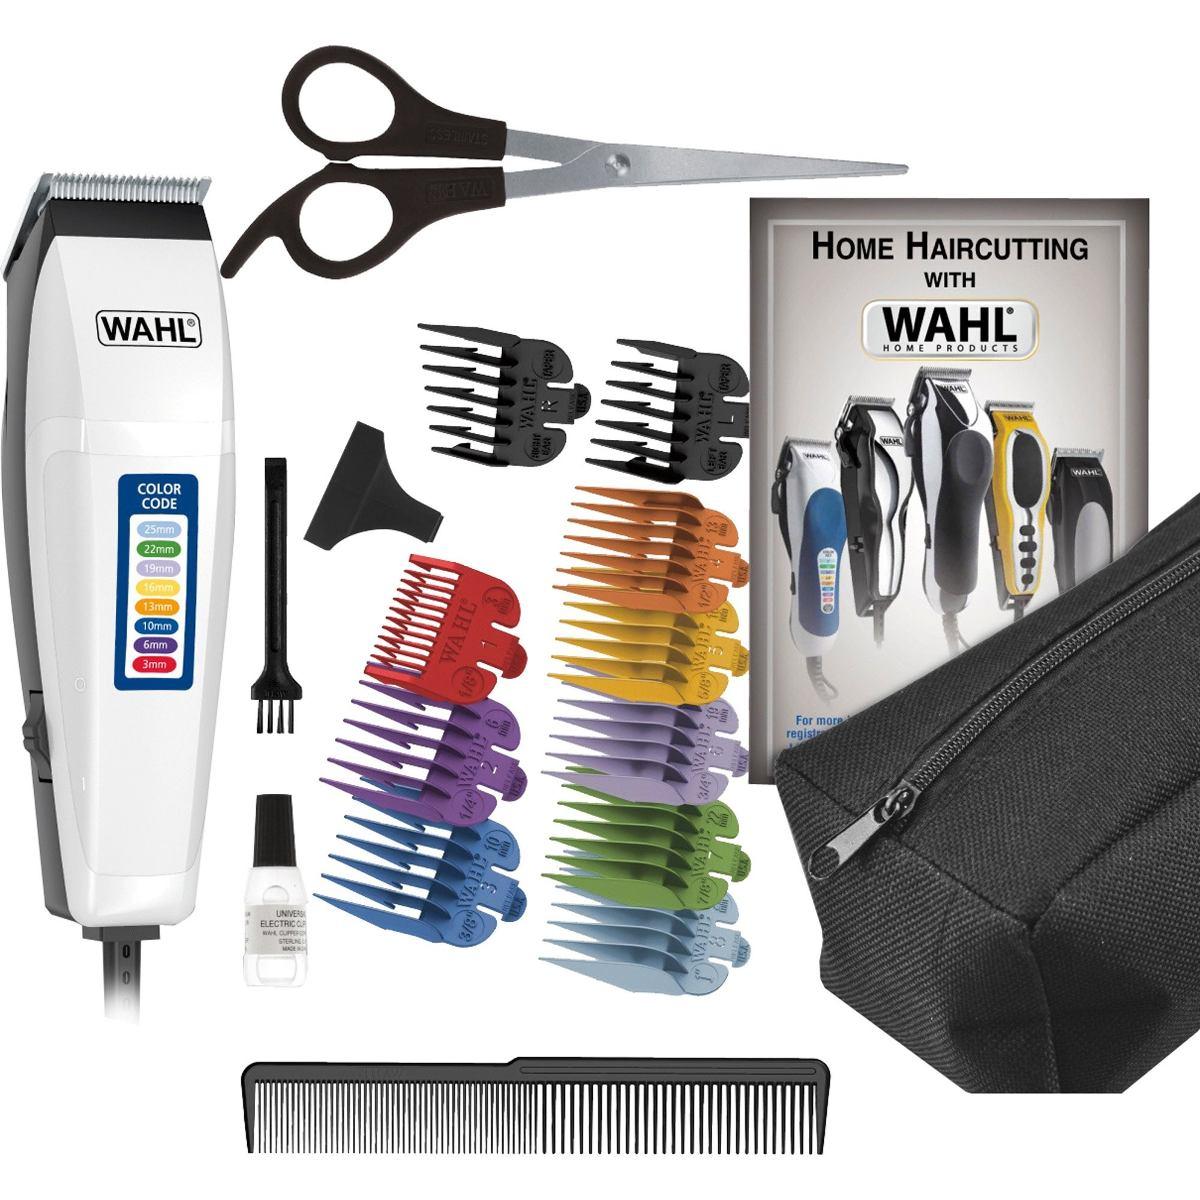 5f7fc4a2c cortador de cabelos profissional wahl 17 acessórios col 110v. Carregando  zoom.